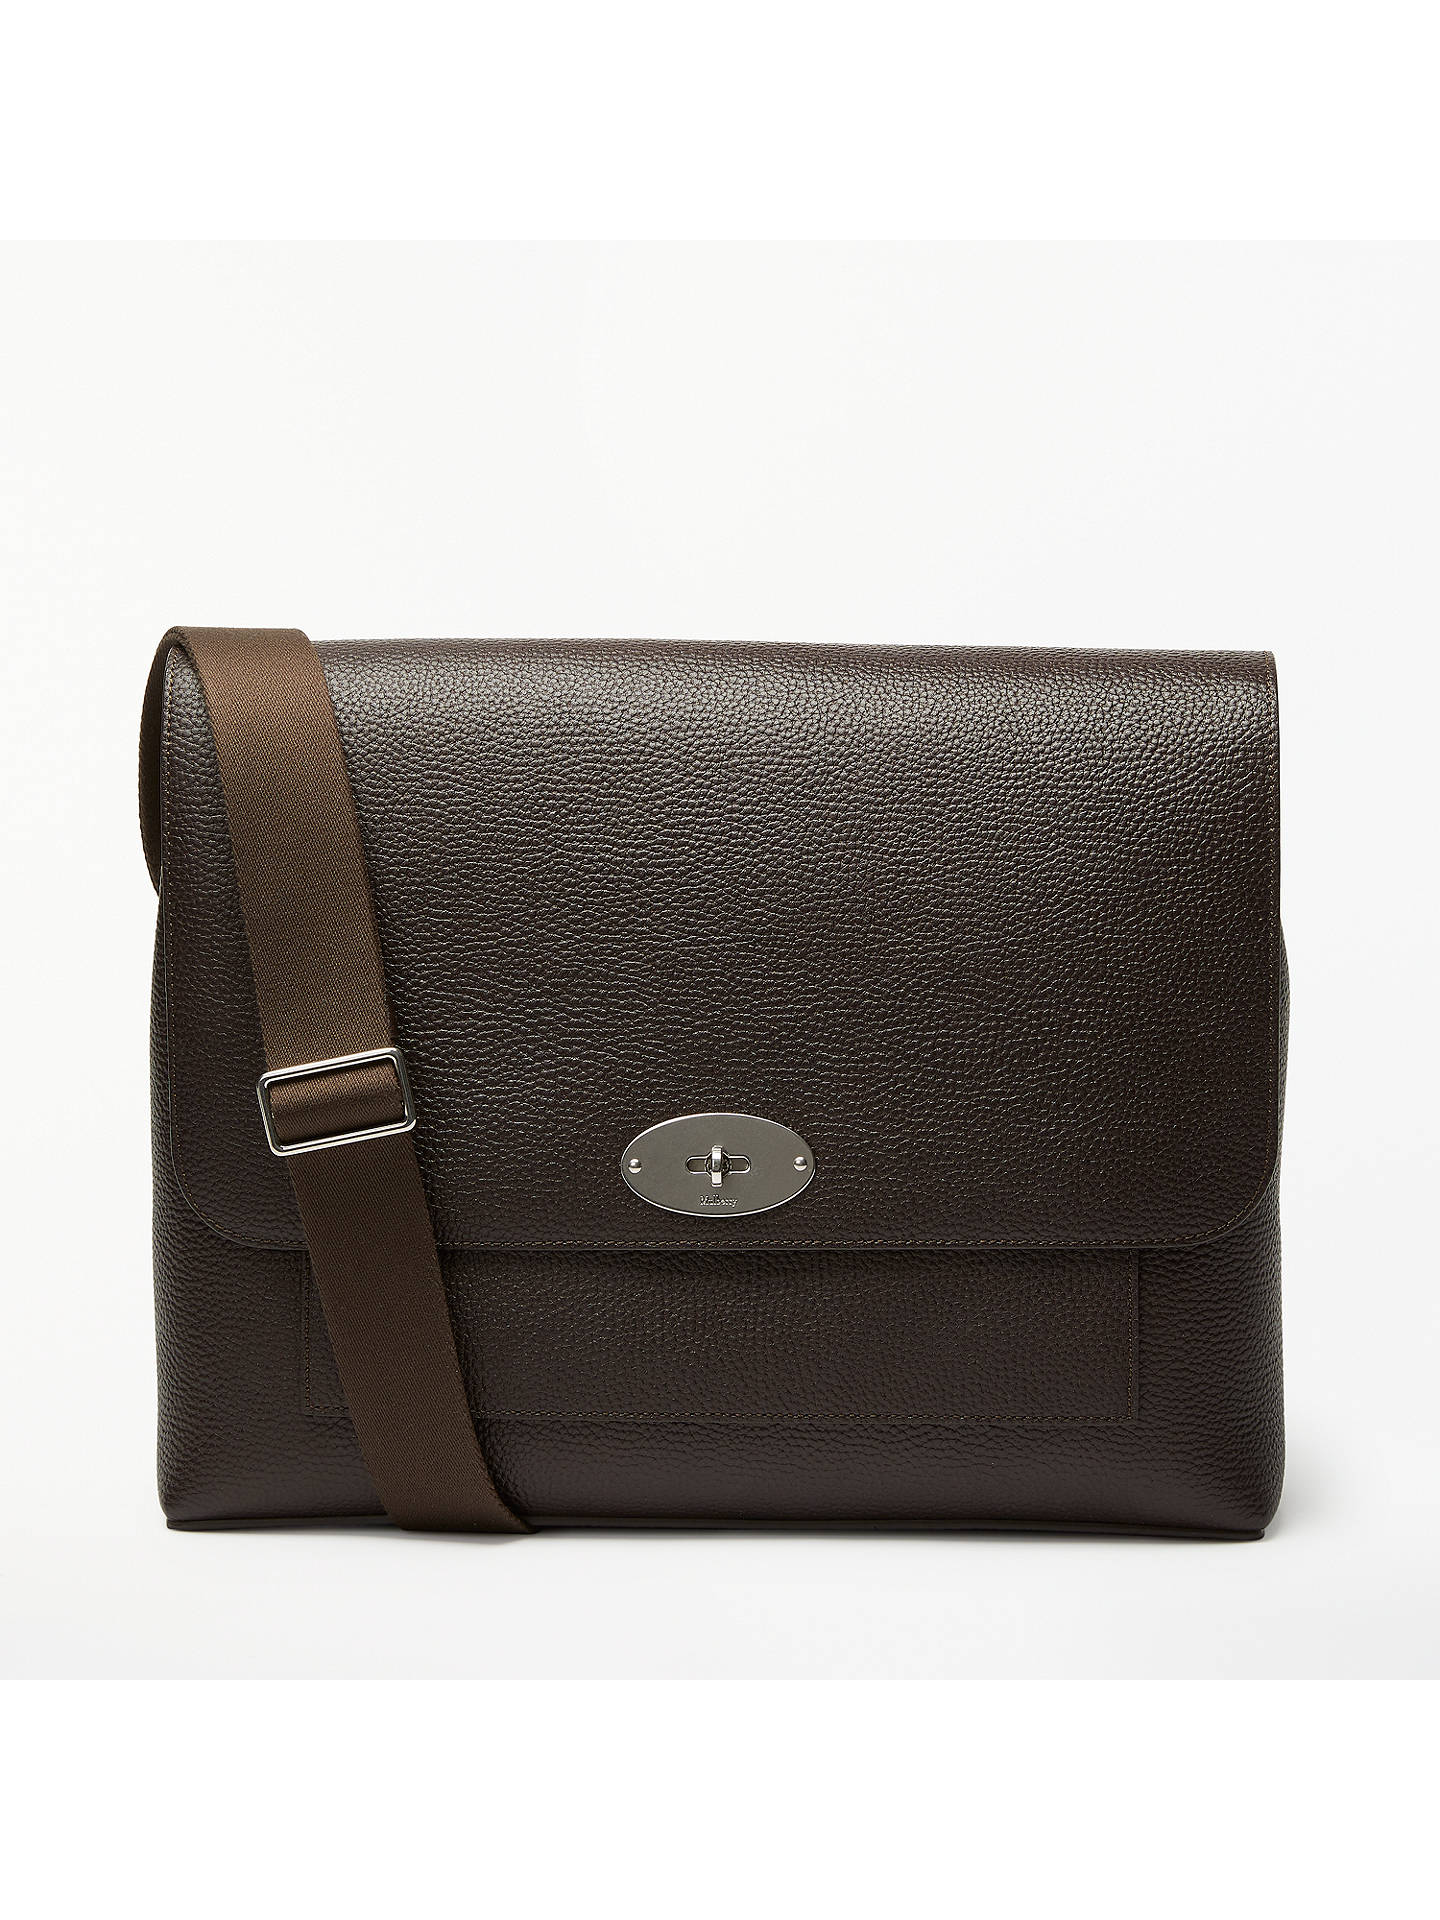 7ba46b243c Buy Mulberry East West Antony Messenger Bag